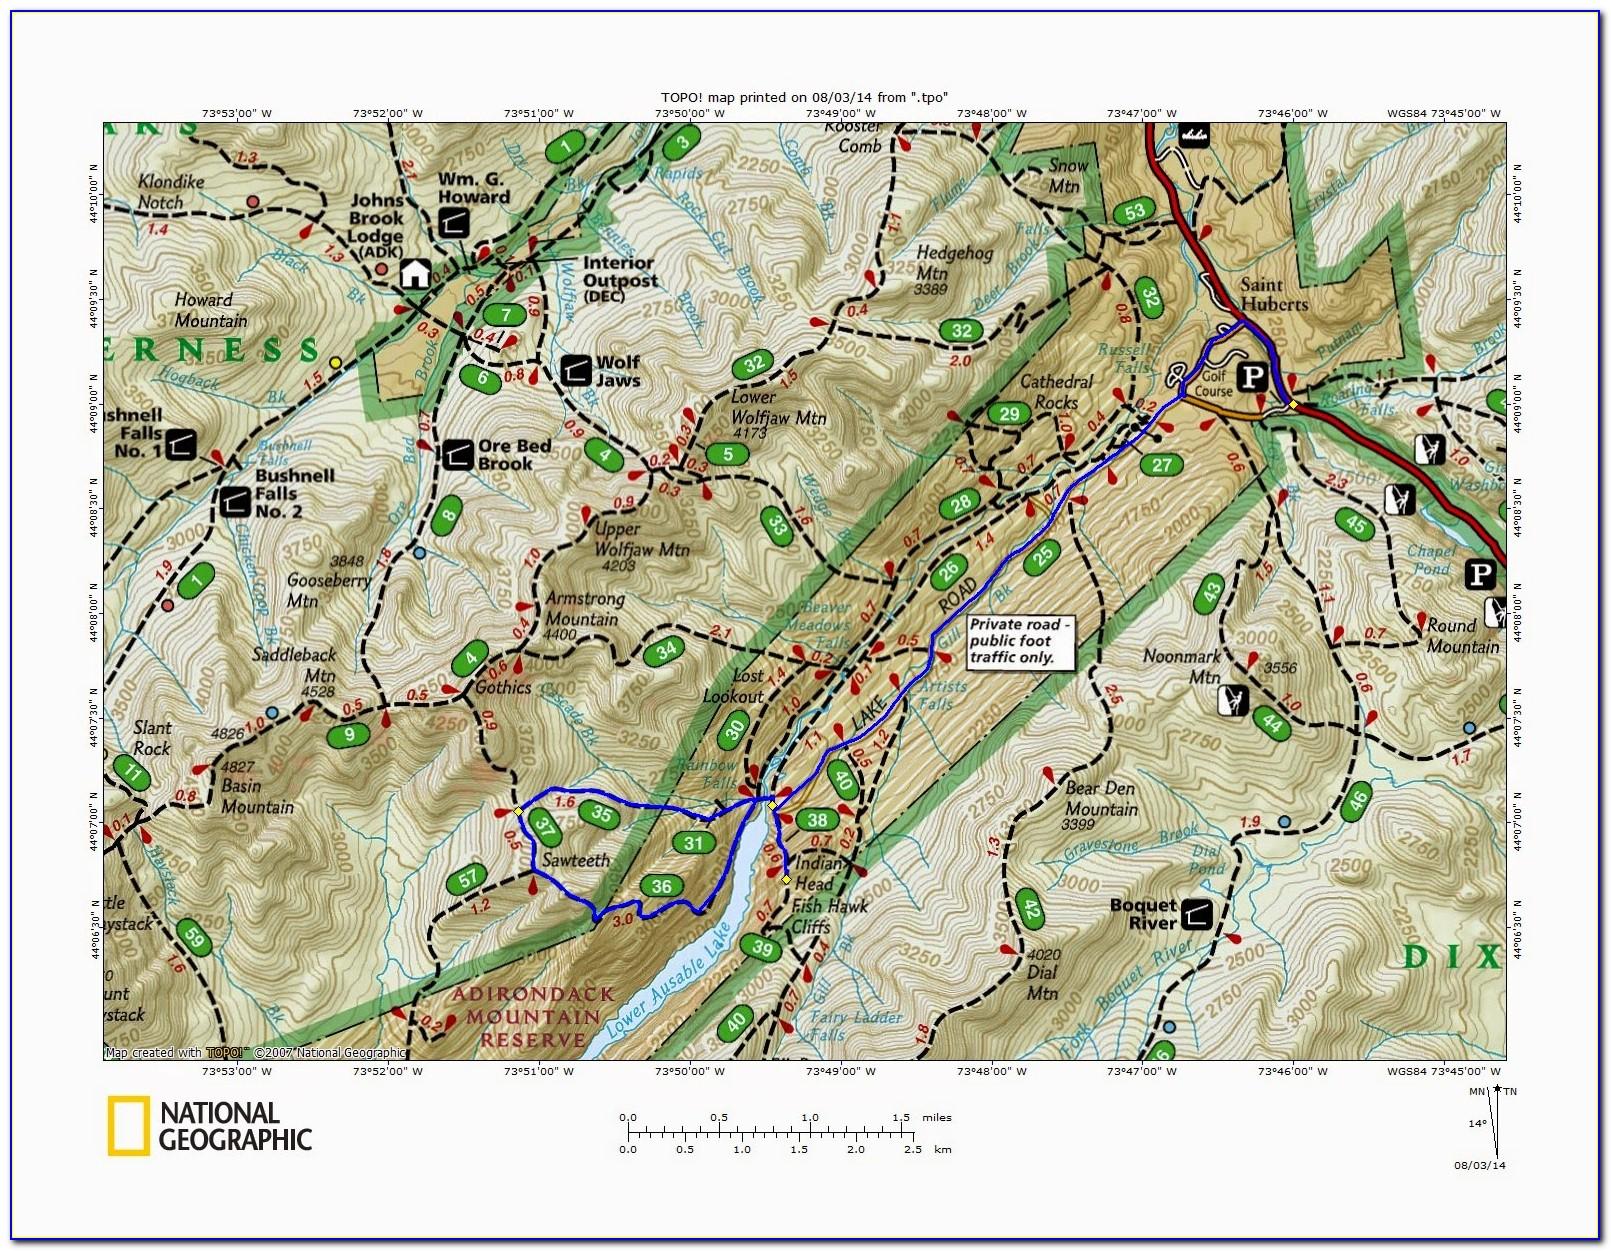 Adirondack Snowmobile Trail Maps